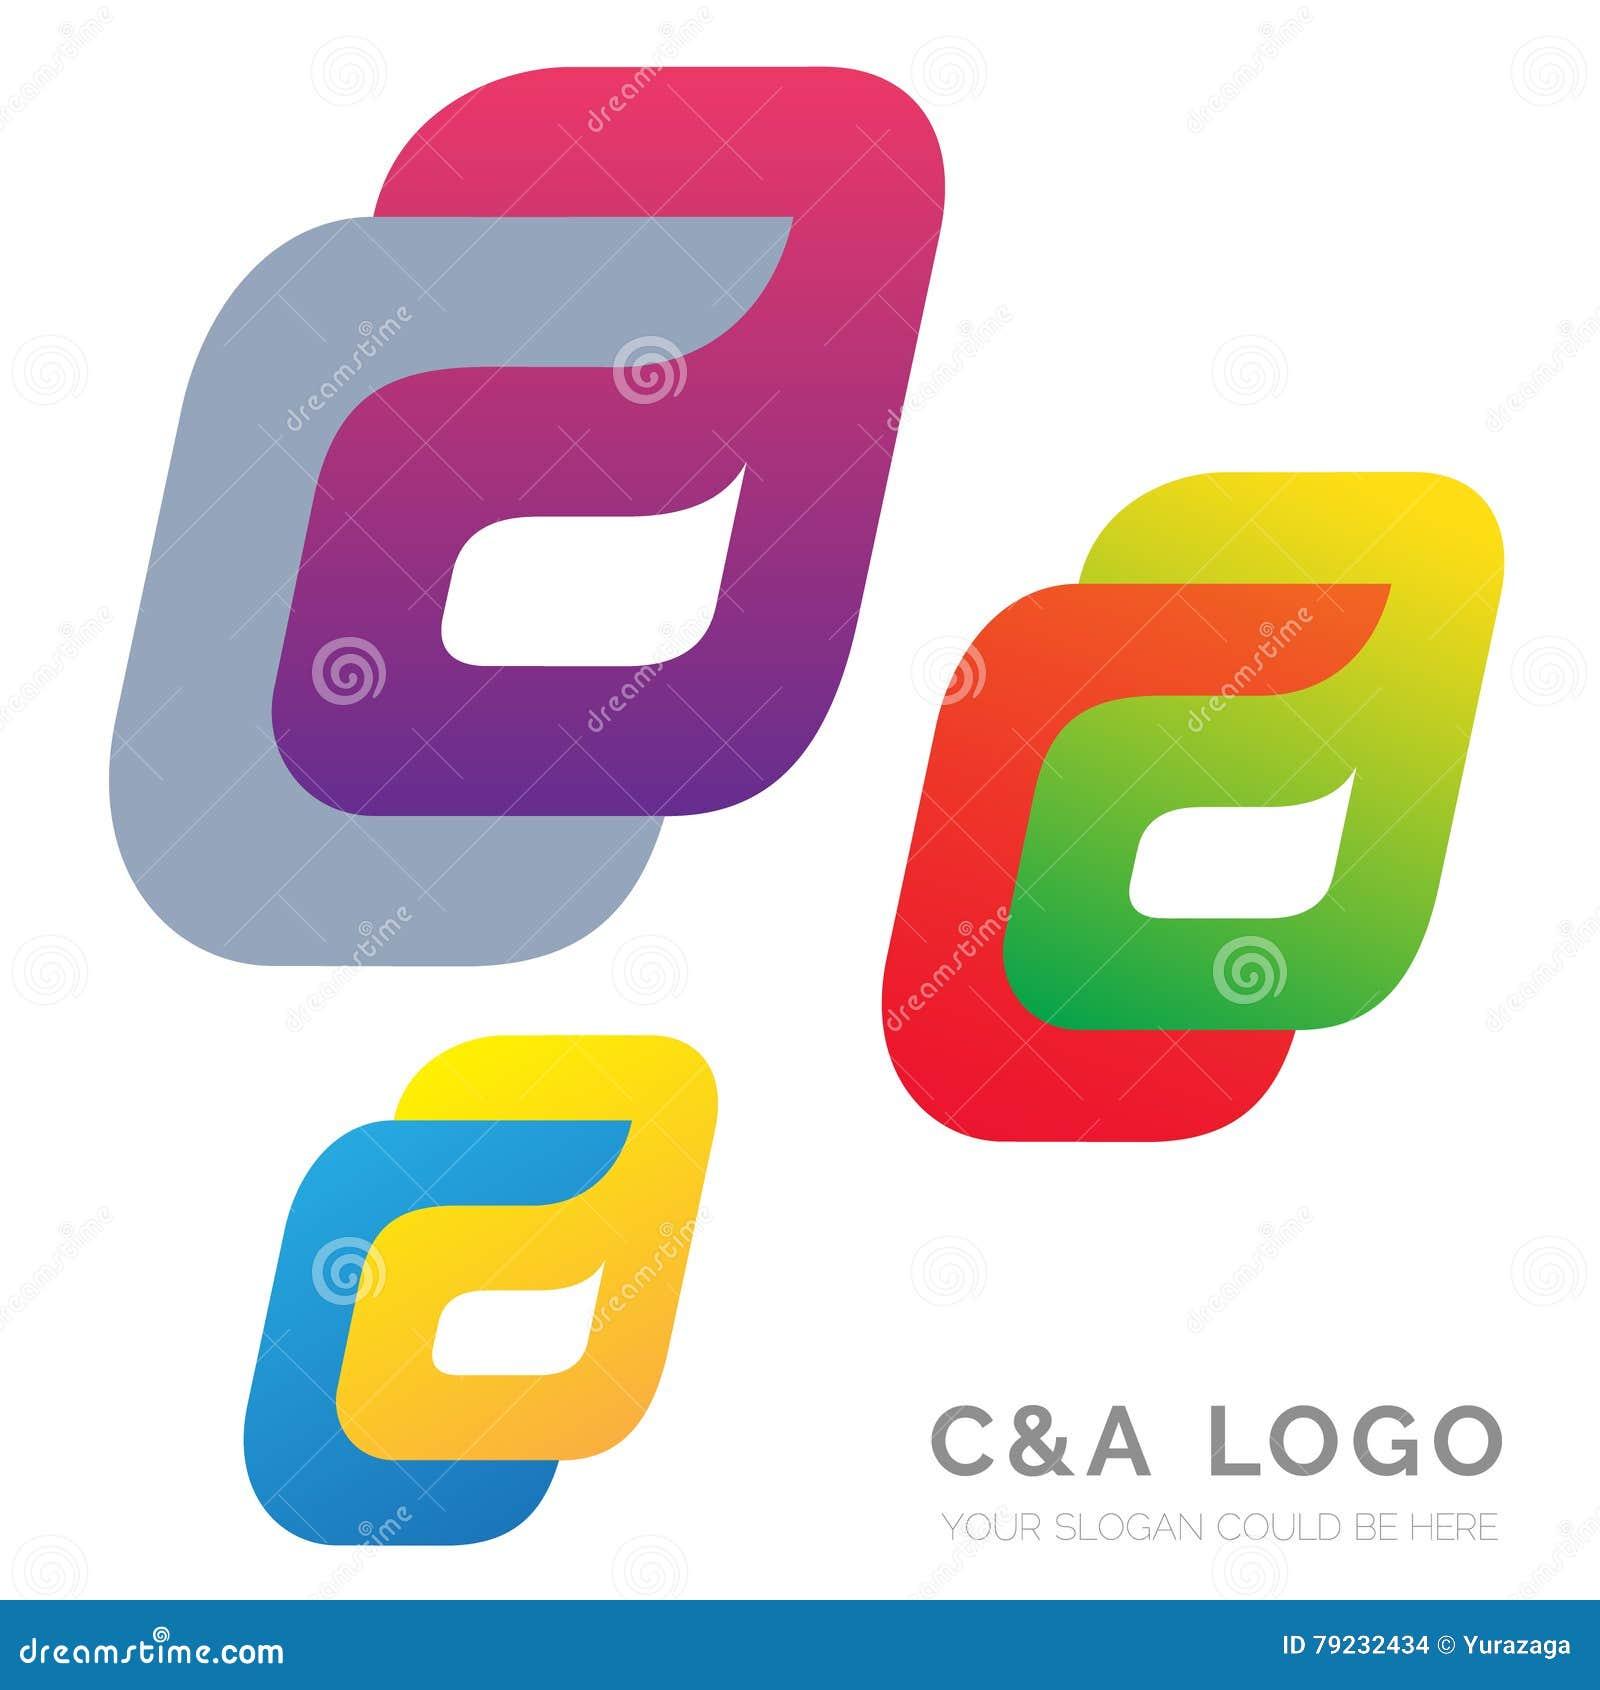 Logo With Barber Concept Design For Branding: Vector Logo Design Stock Illustration. Illustration Of